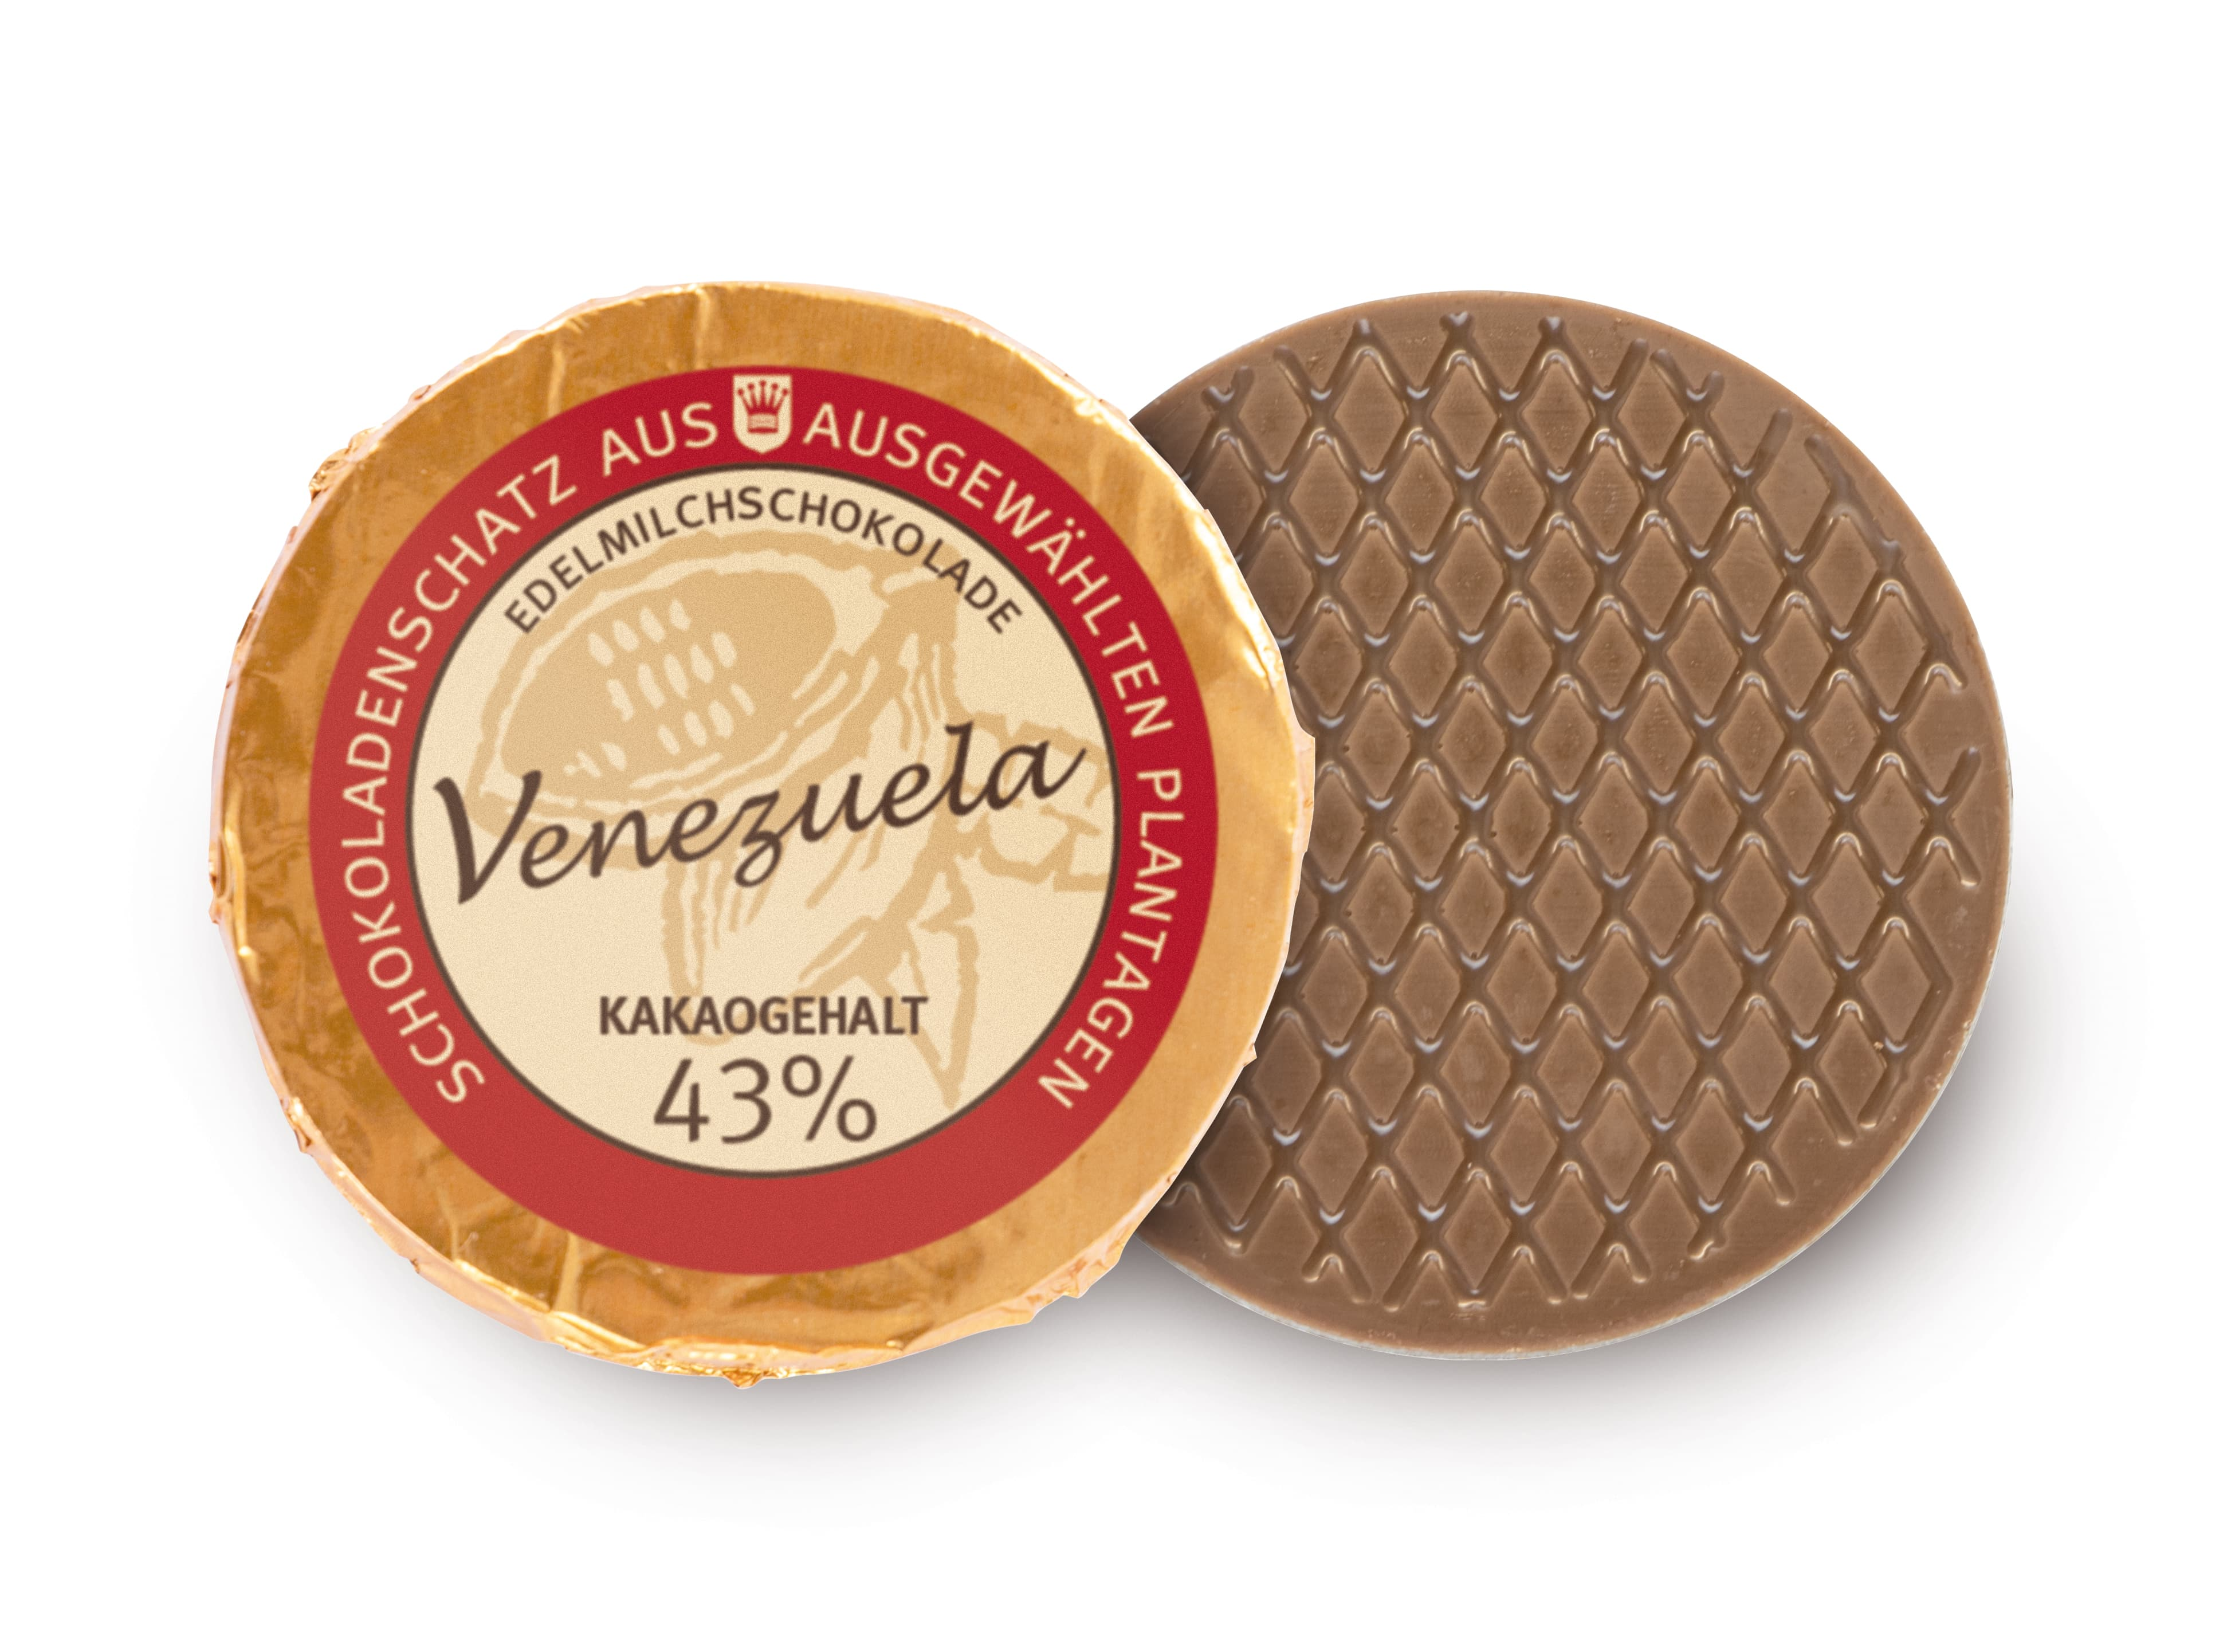 Golddublone aus Venezuela-Schokolade mit 43 % Kakaogehalt